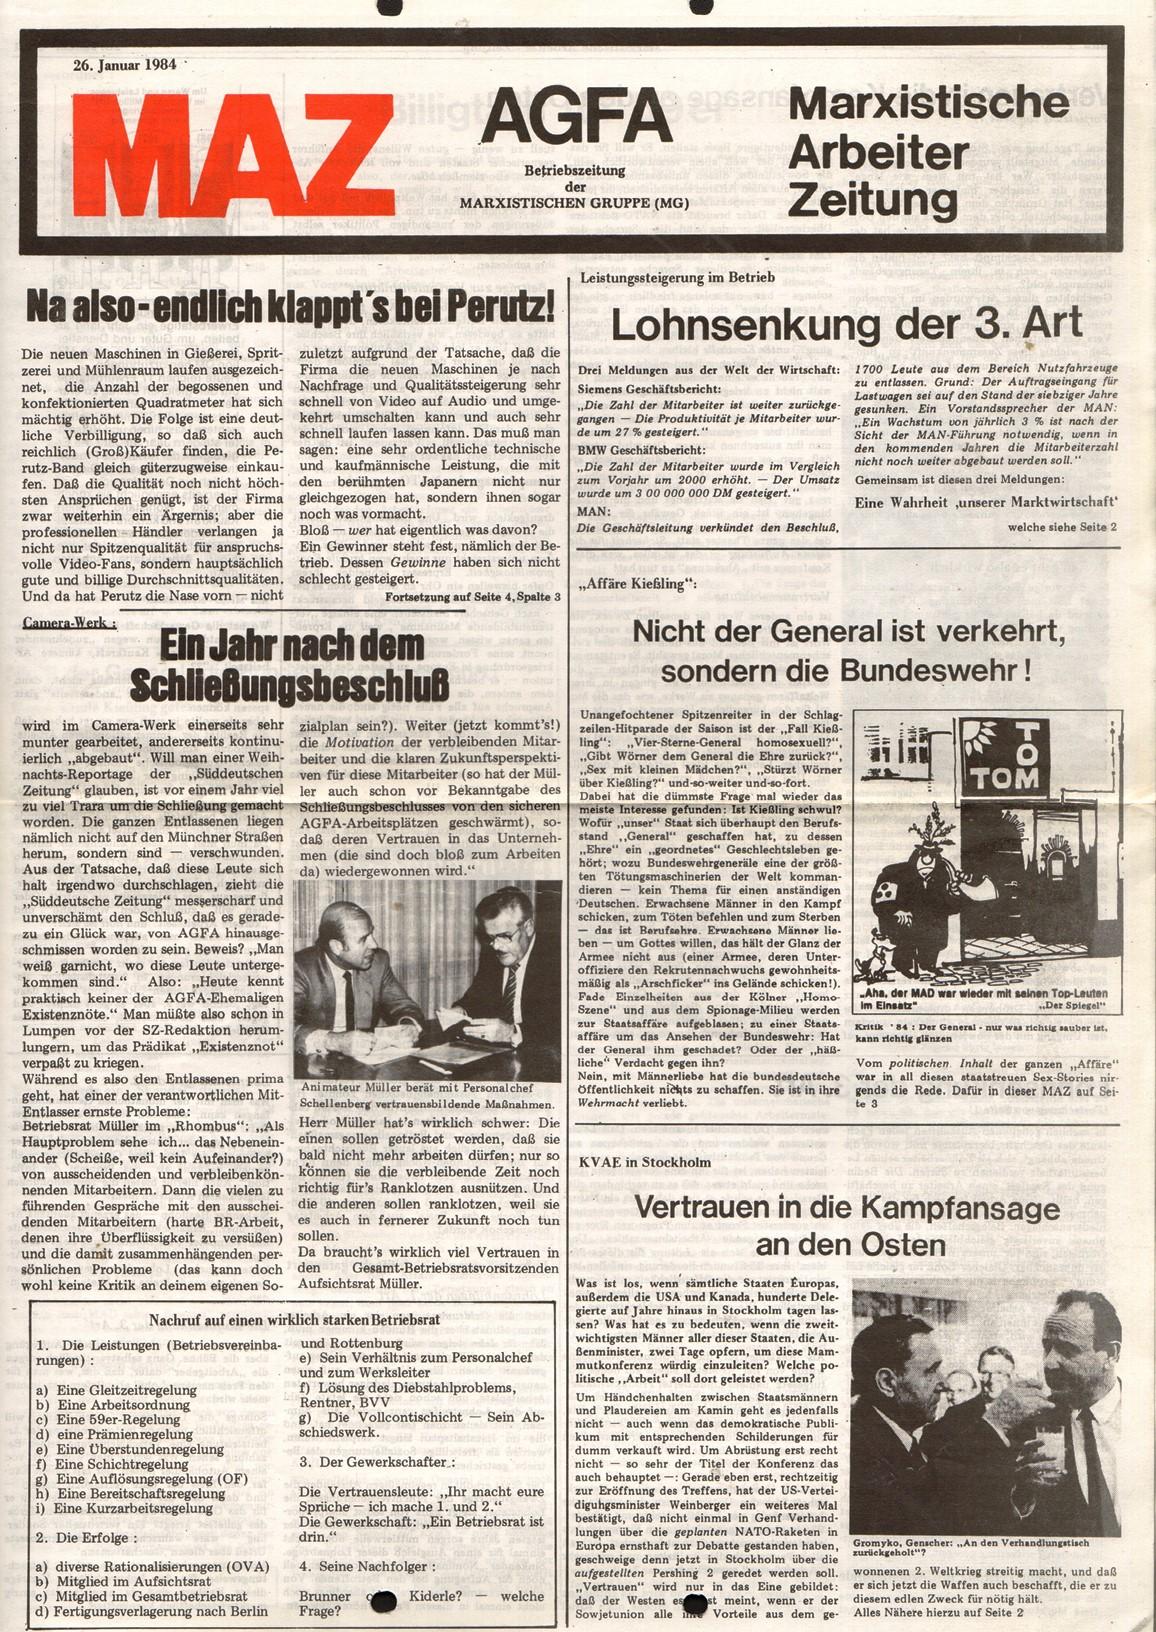 Muenchen_MG_MAZ_AGFA_19840126_01